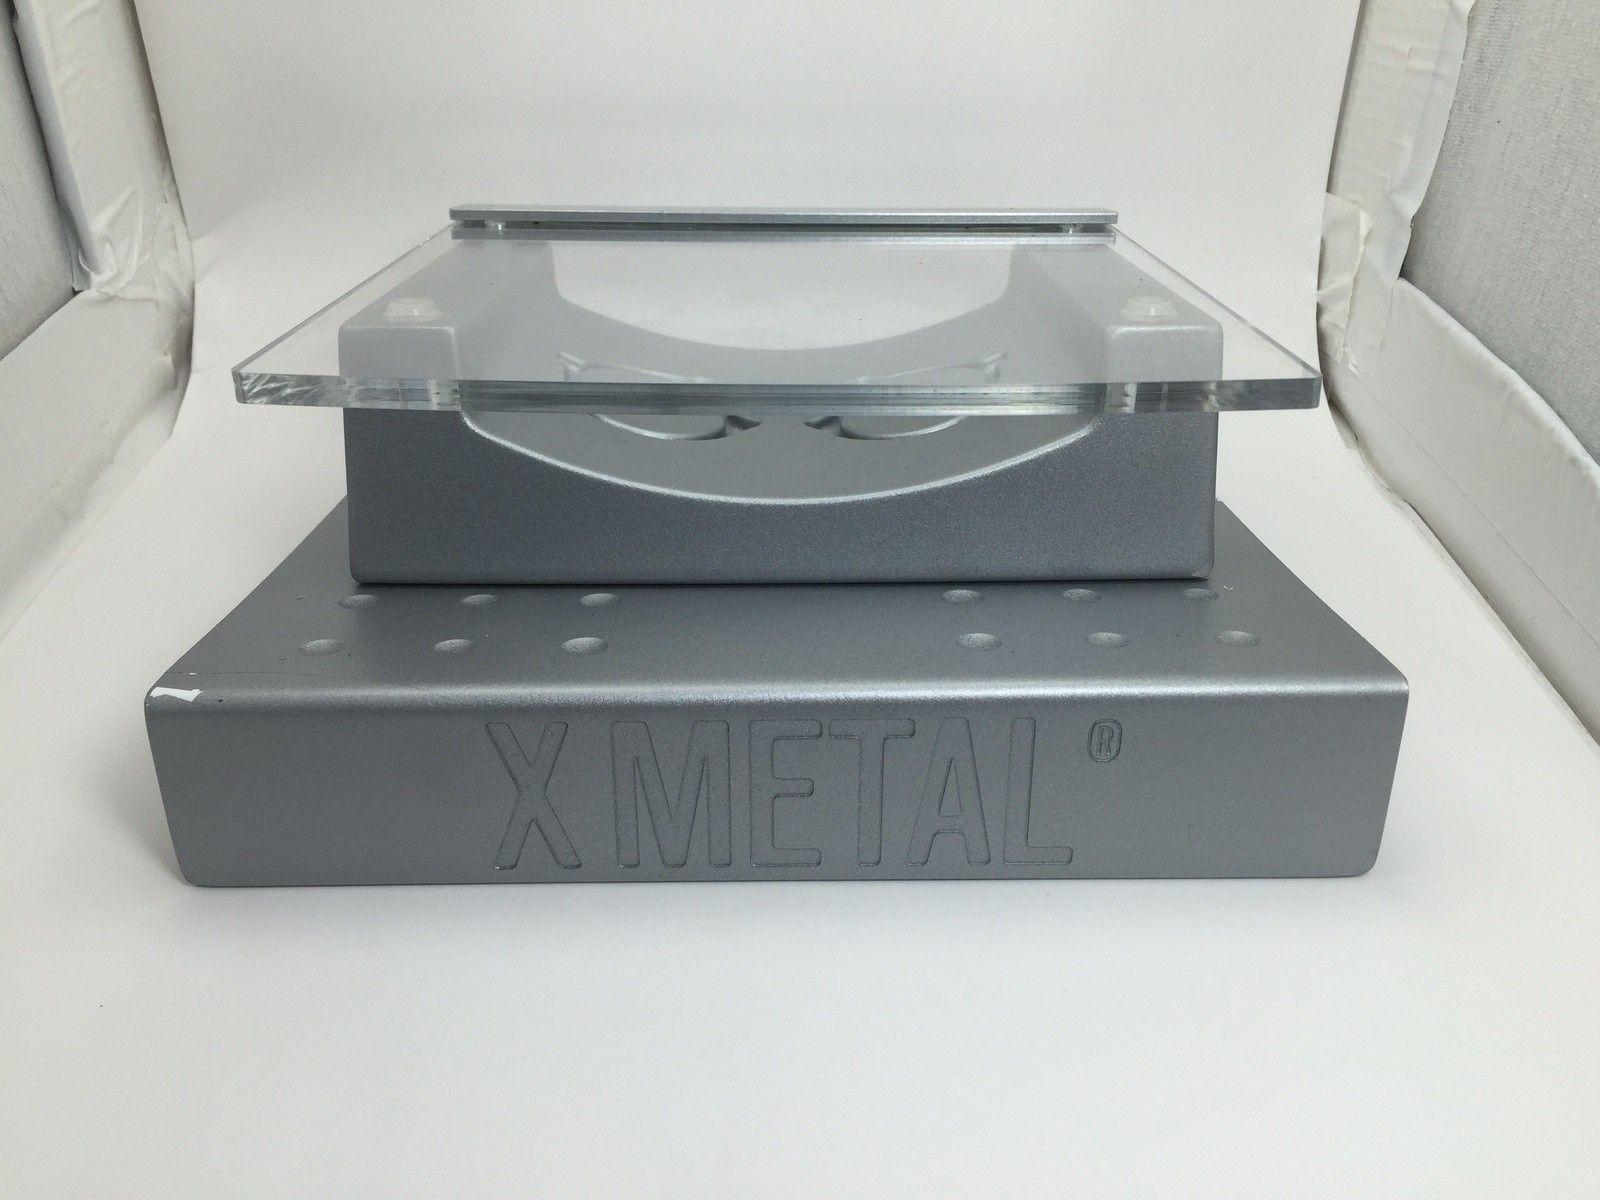 xmetal-my-ass_22702364926_o.jpg